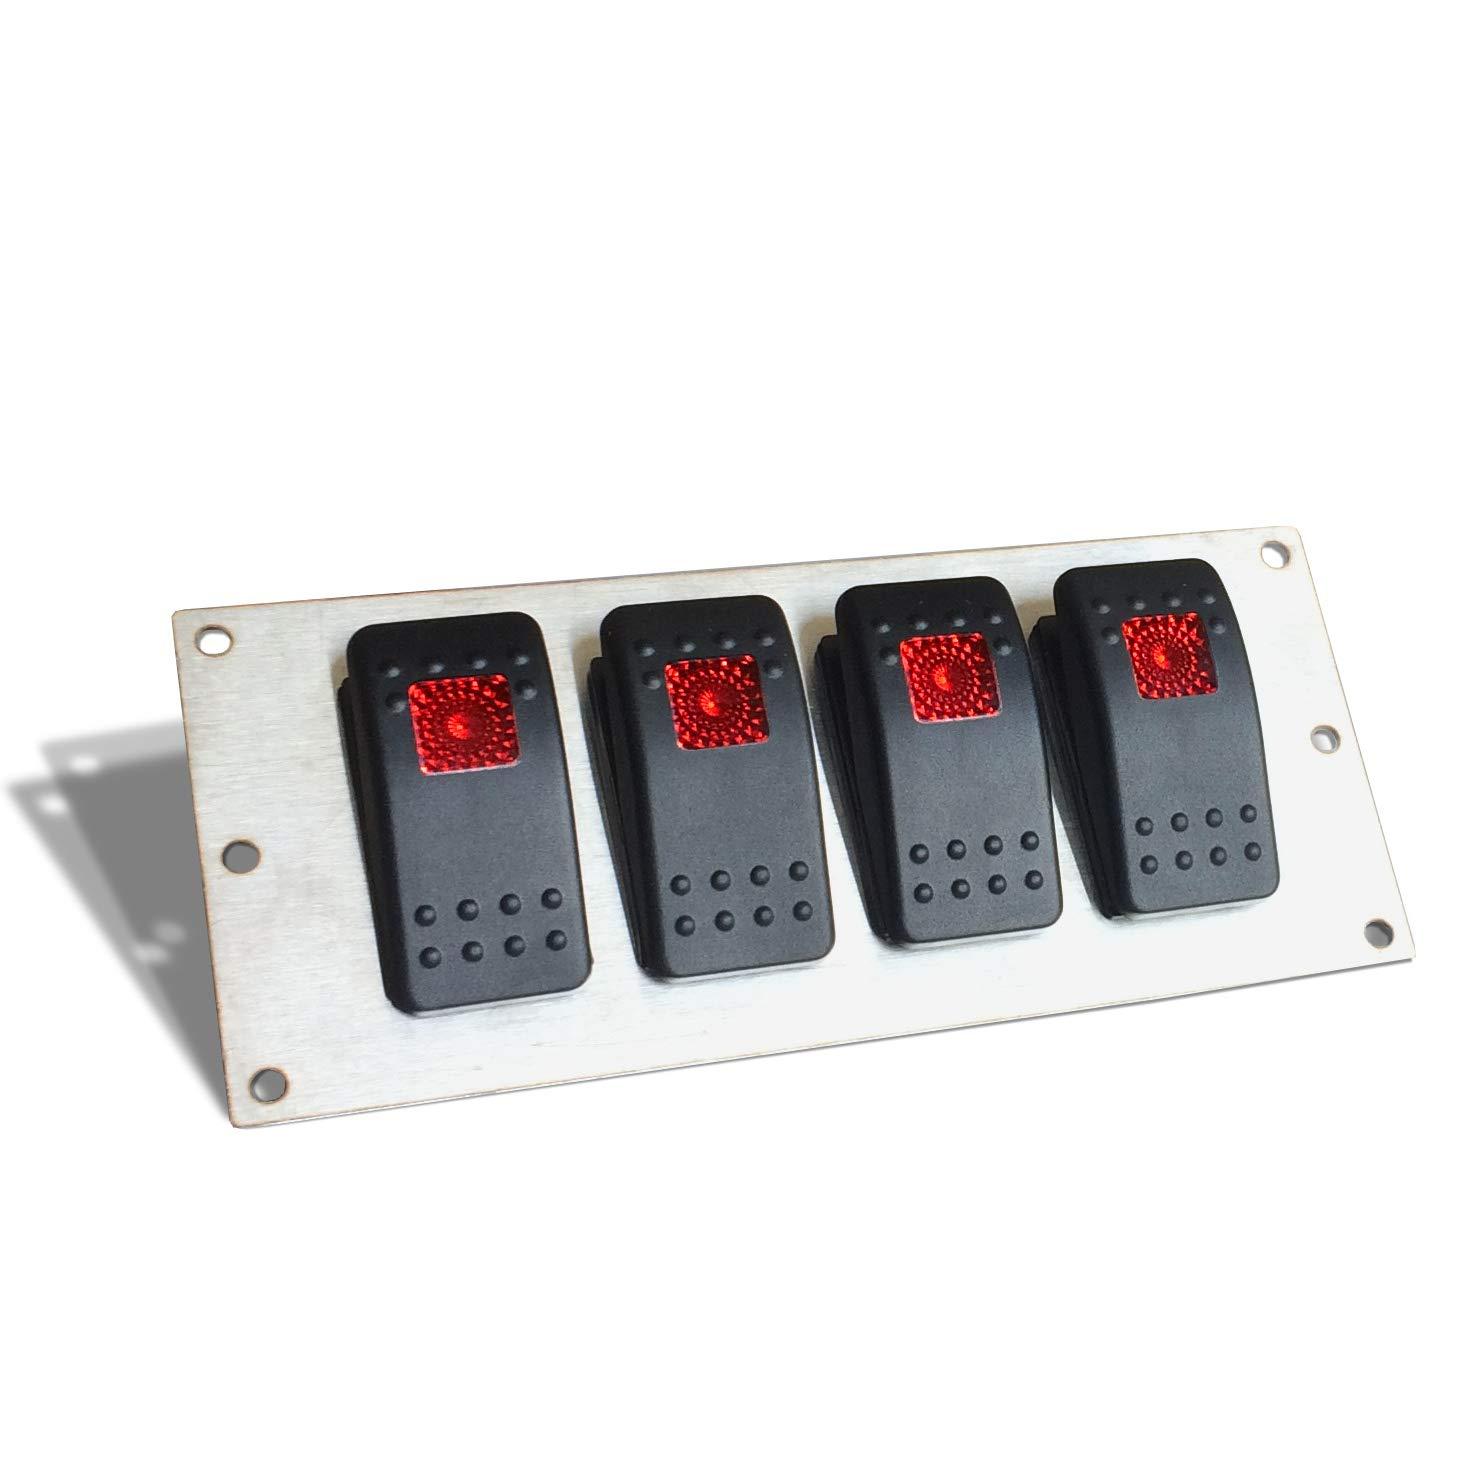 Extreme Max 3006.6809 Marine Grade 12V Toggle Switch Panel 5 Toggle Switches /& 1 Hermit DC Socket